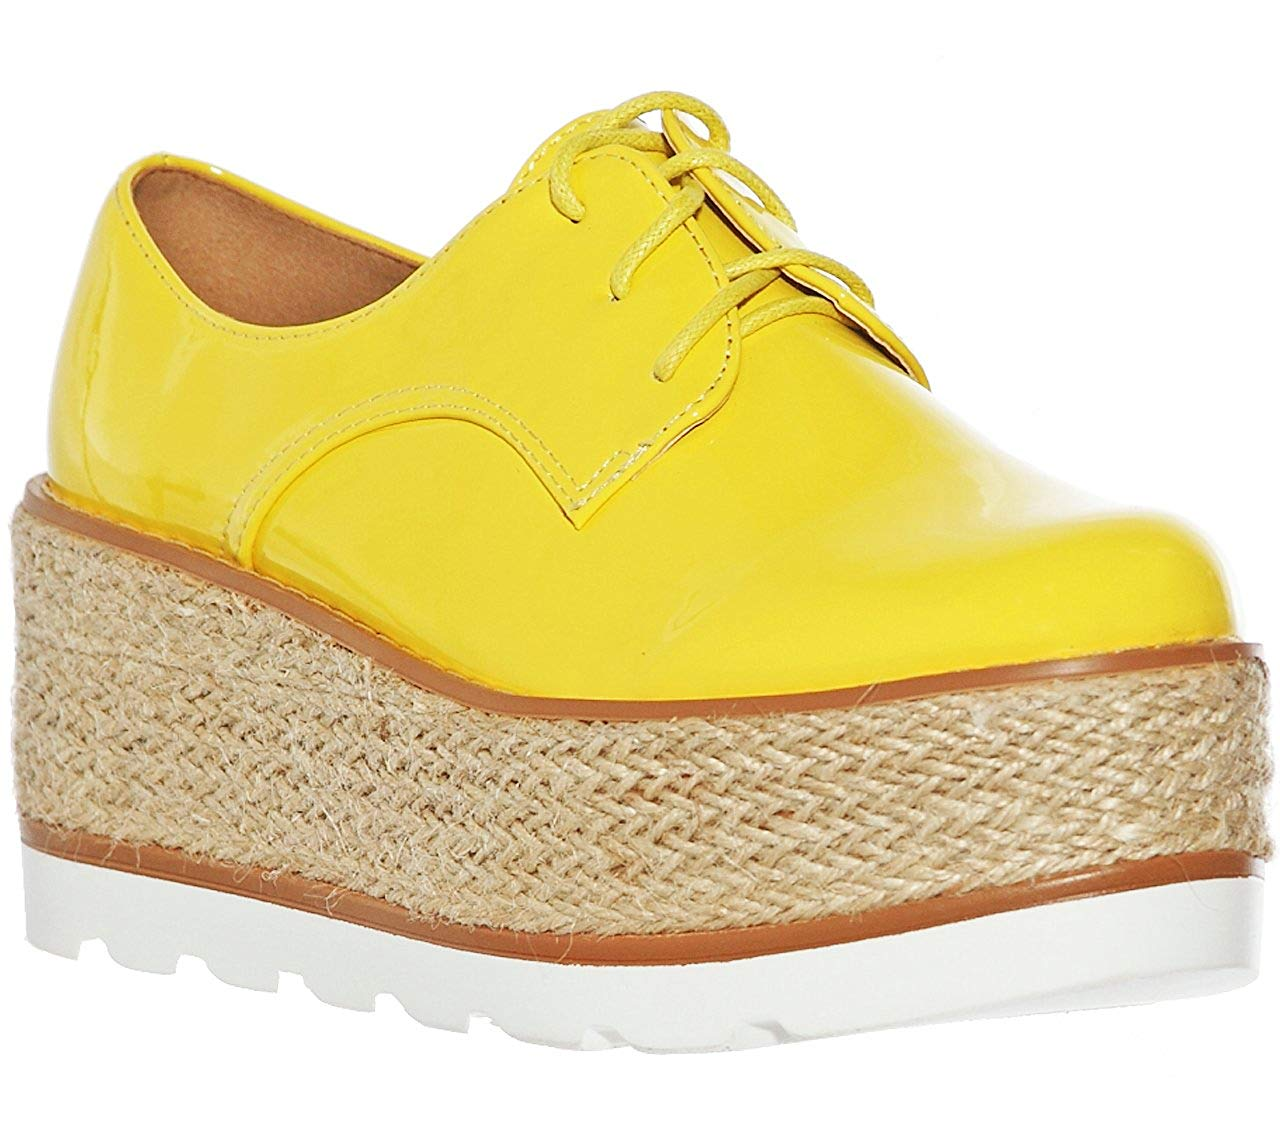 97ea7021839 Get Quotations · Women s Oxford Platform Lace up Creeper Shoes